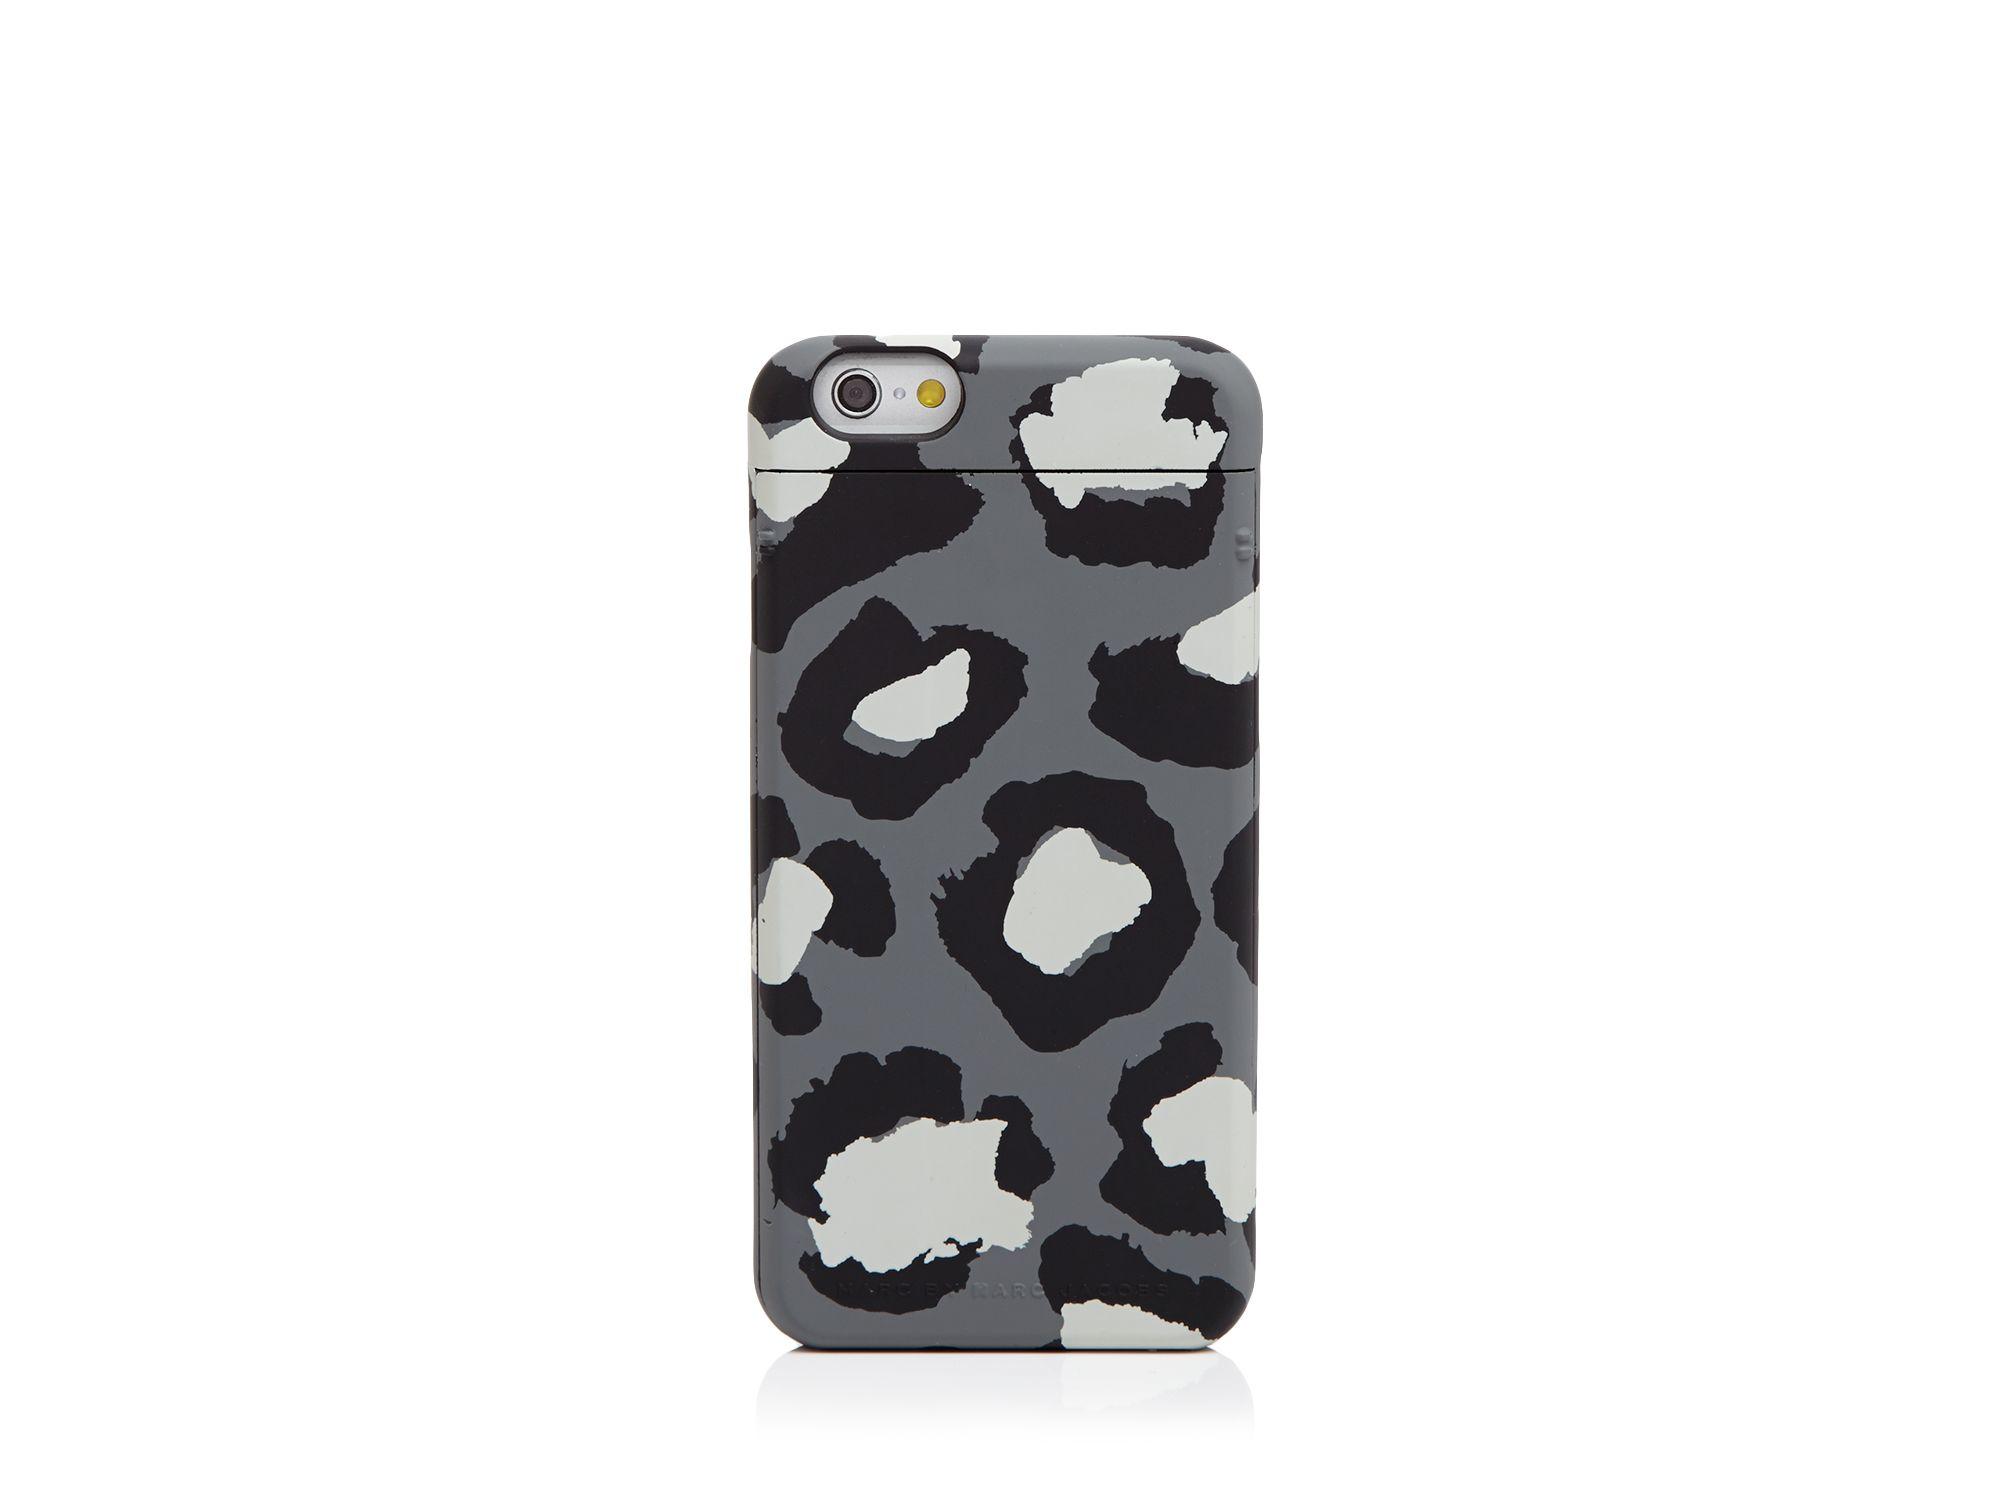 marc by marc jacobs poker face leopard print iphone 6 case. Black Bedroom Furniture Sets. Home Design Ideas